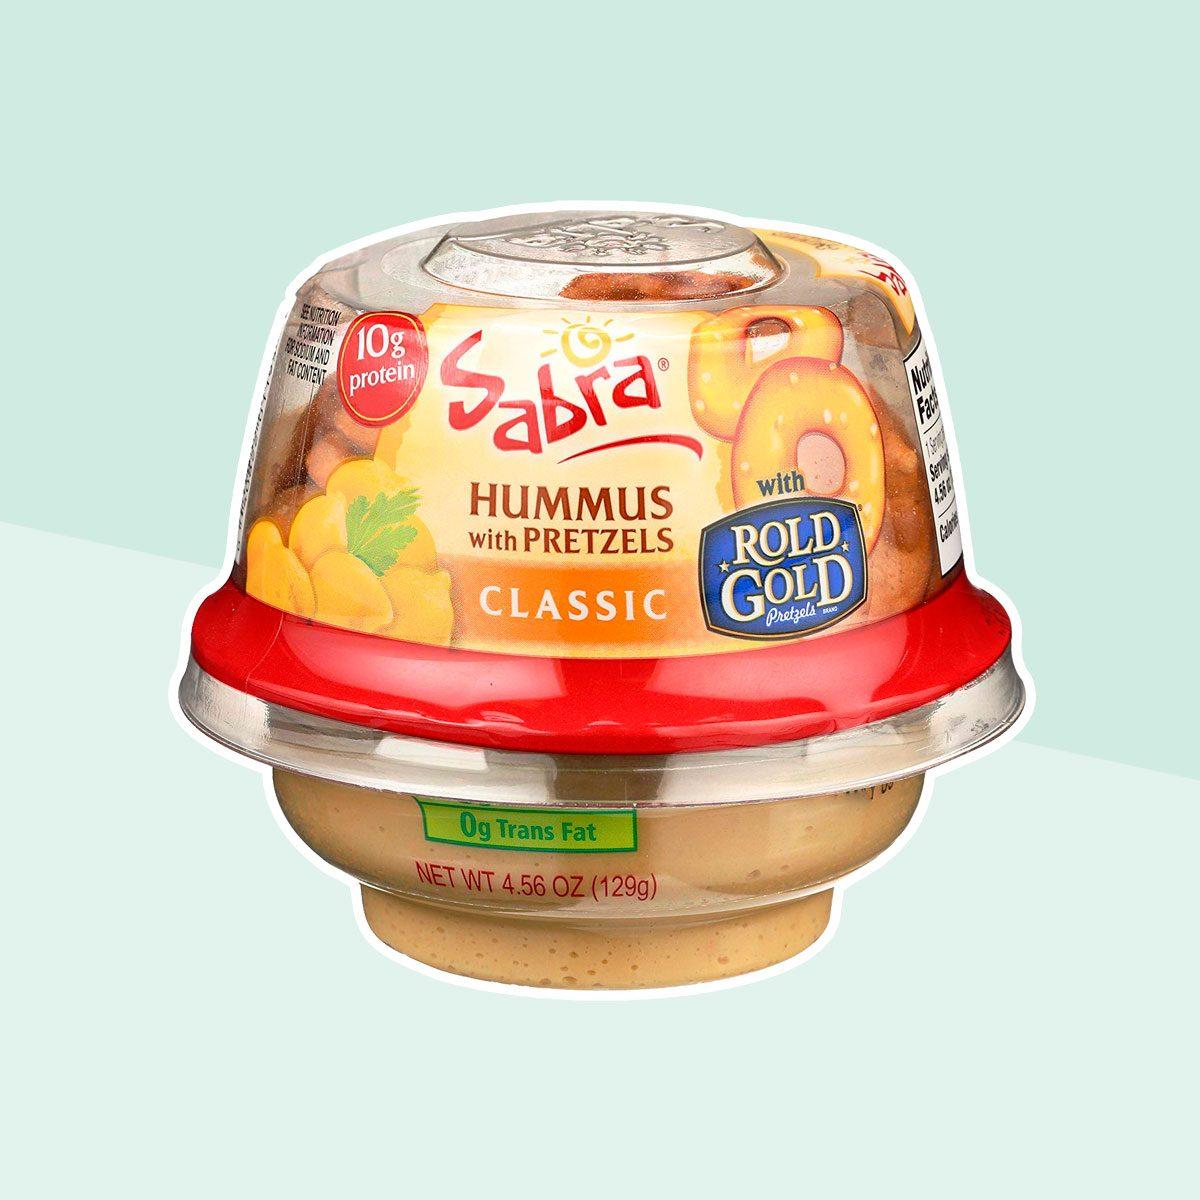 Sabra Grab N Go Hummus with Pretzels Cups